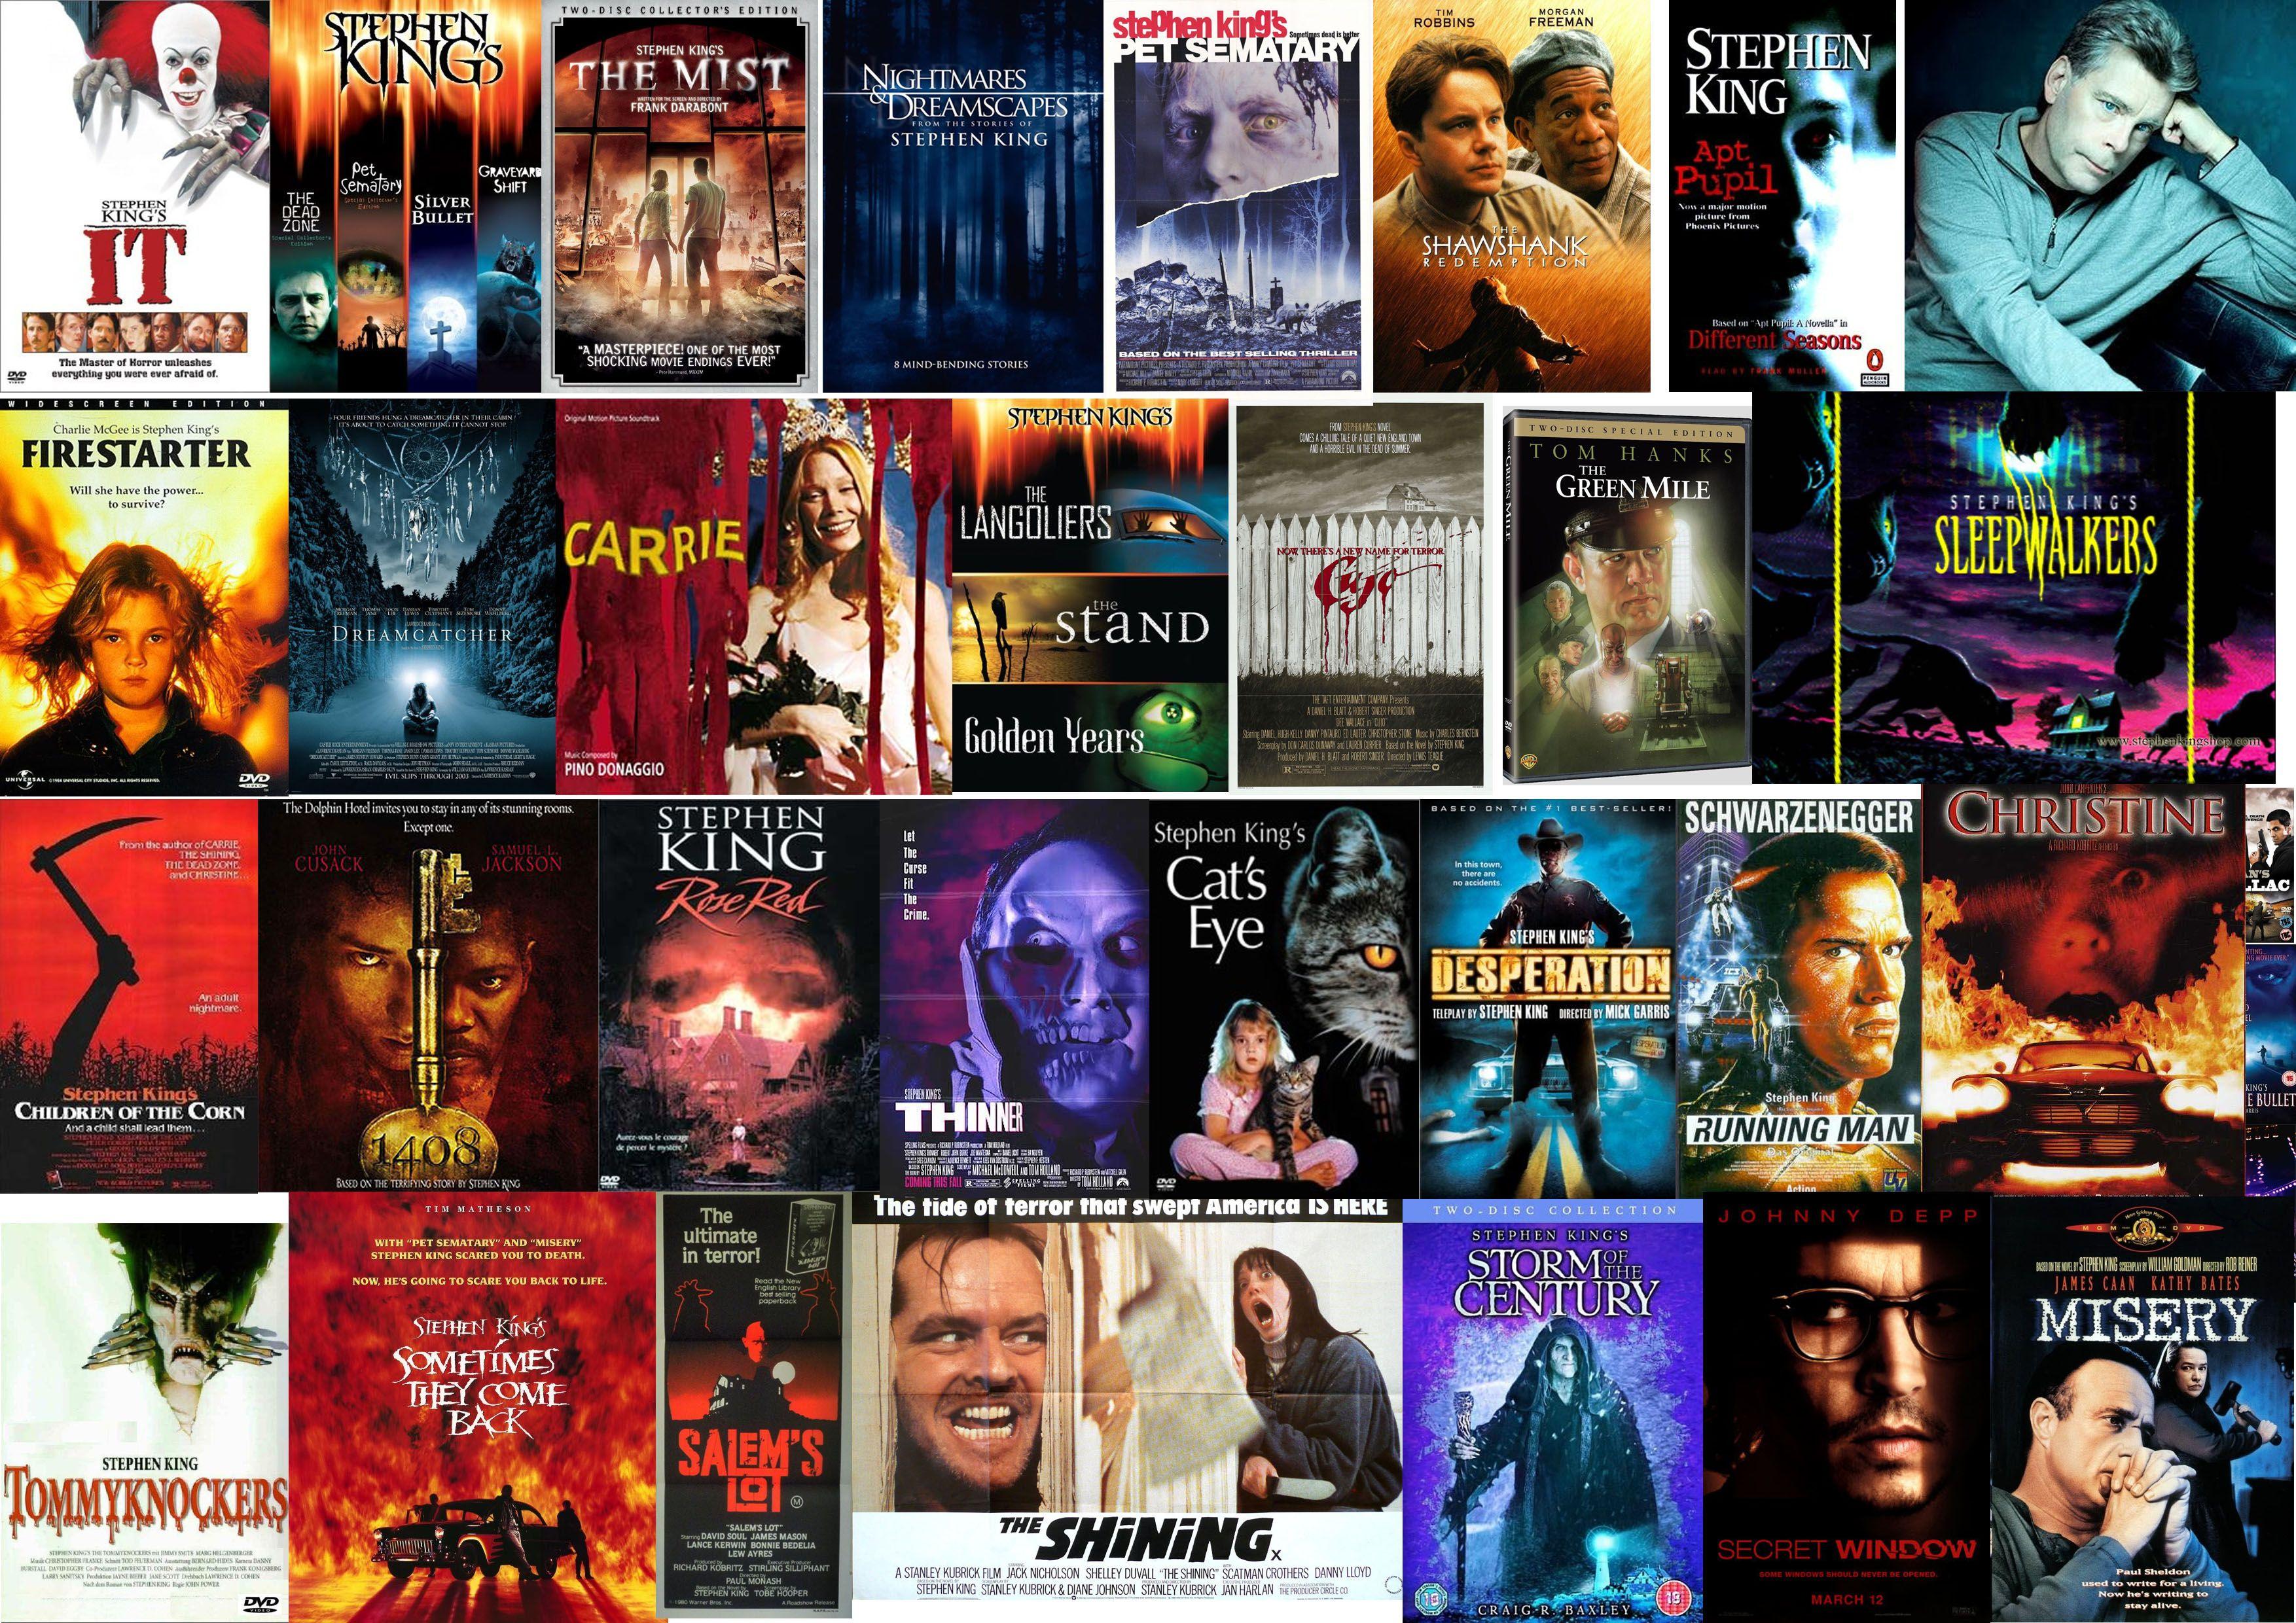 Stephen King - Films